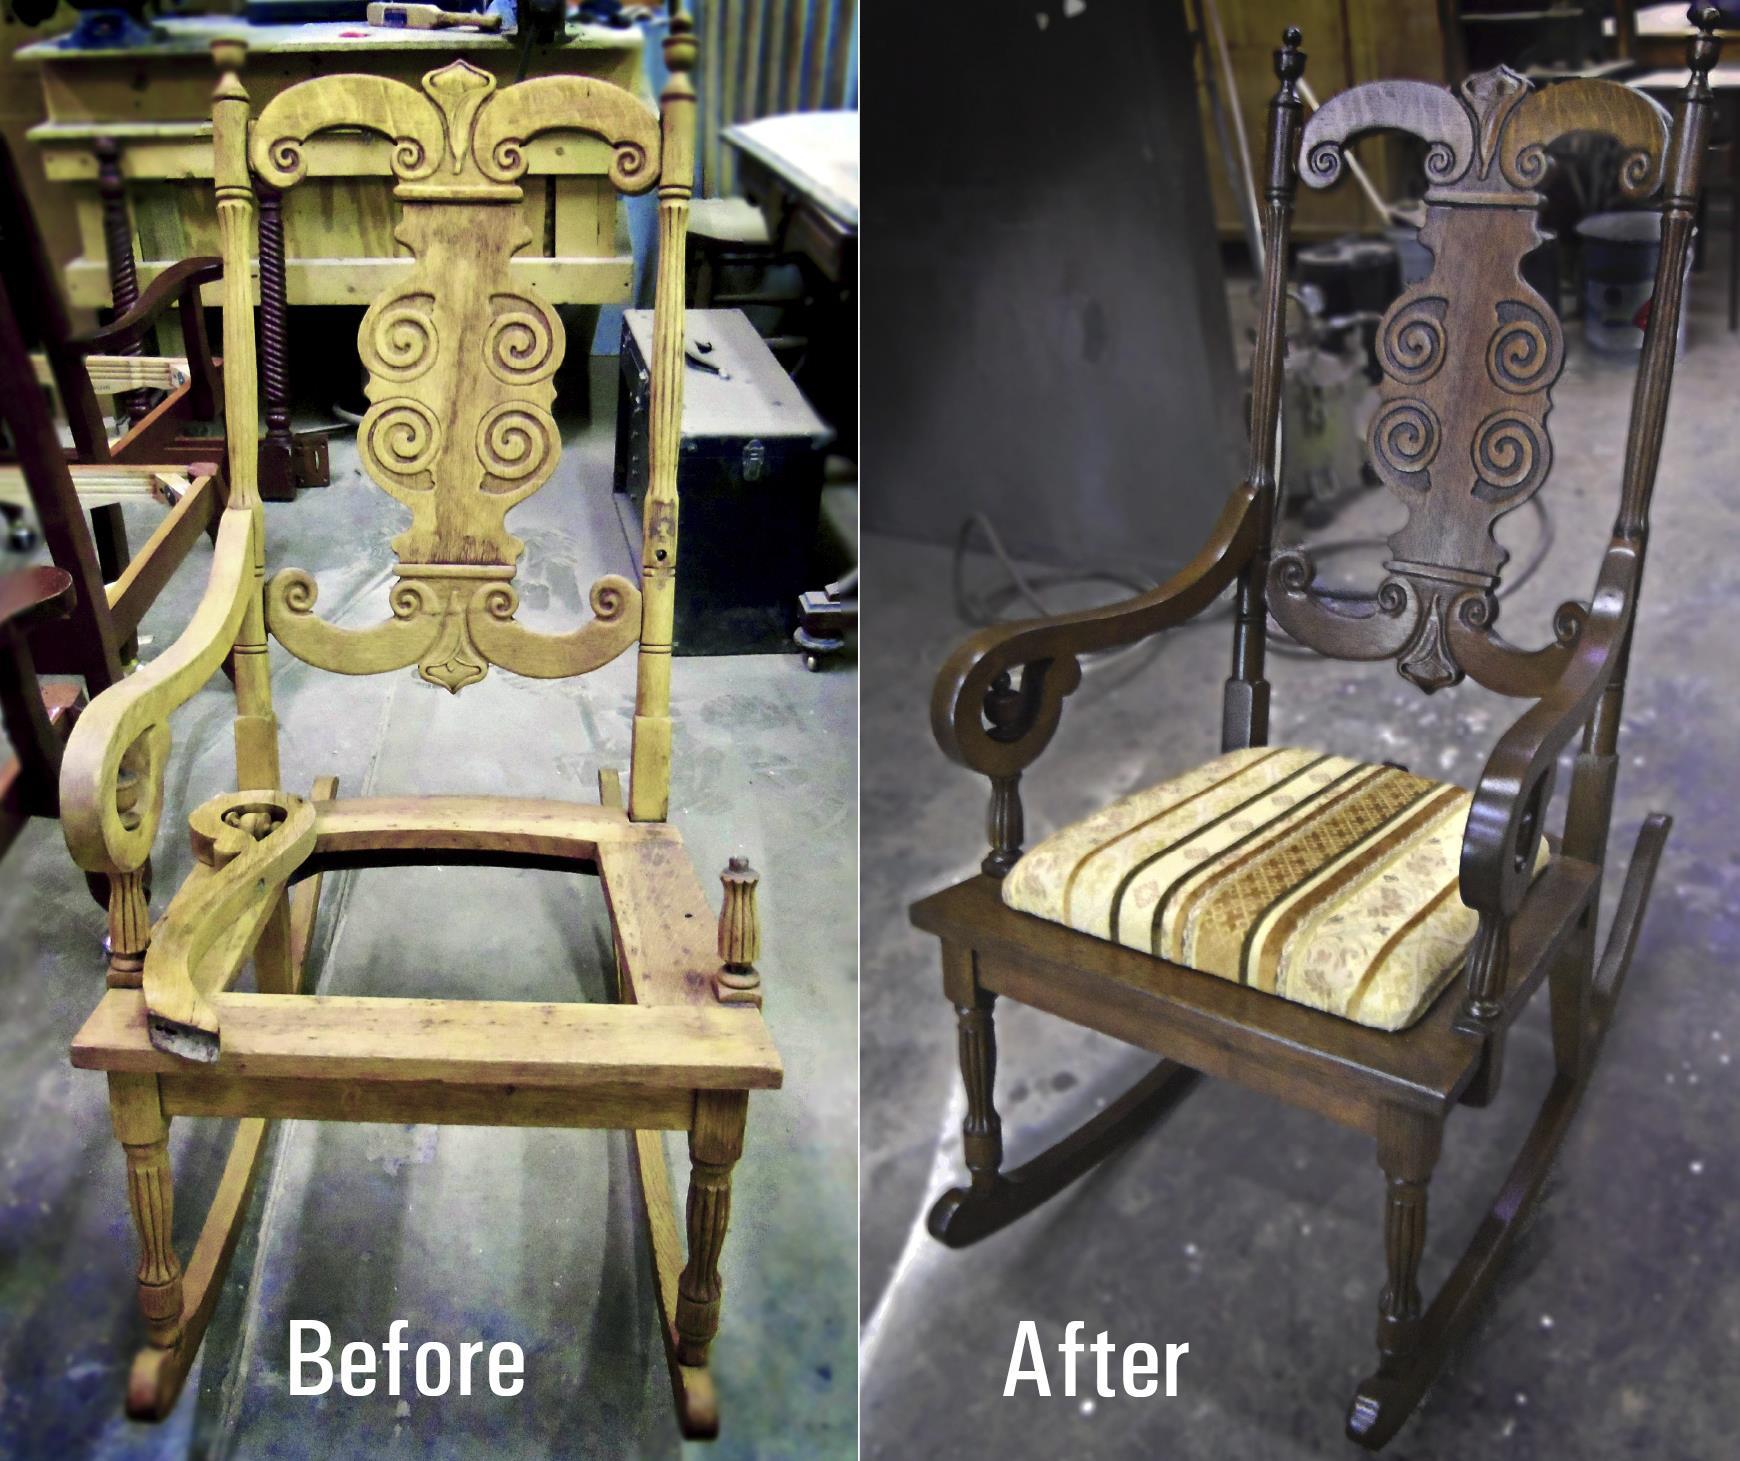 Second Nature Furniture Restoration 594 Northland Blvd, Cincinnati, OH  45240   YP.com